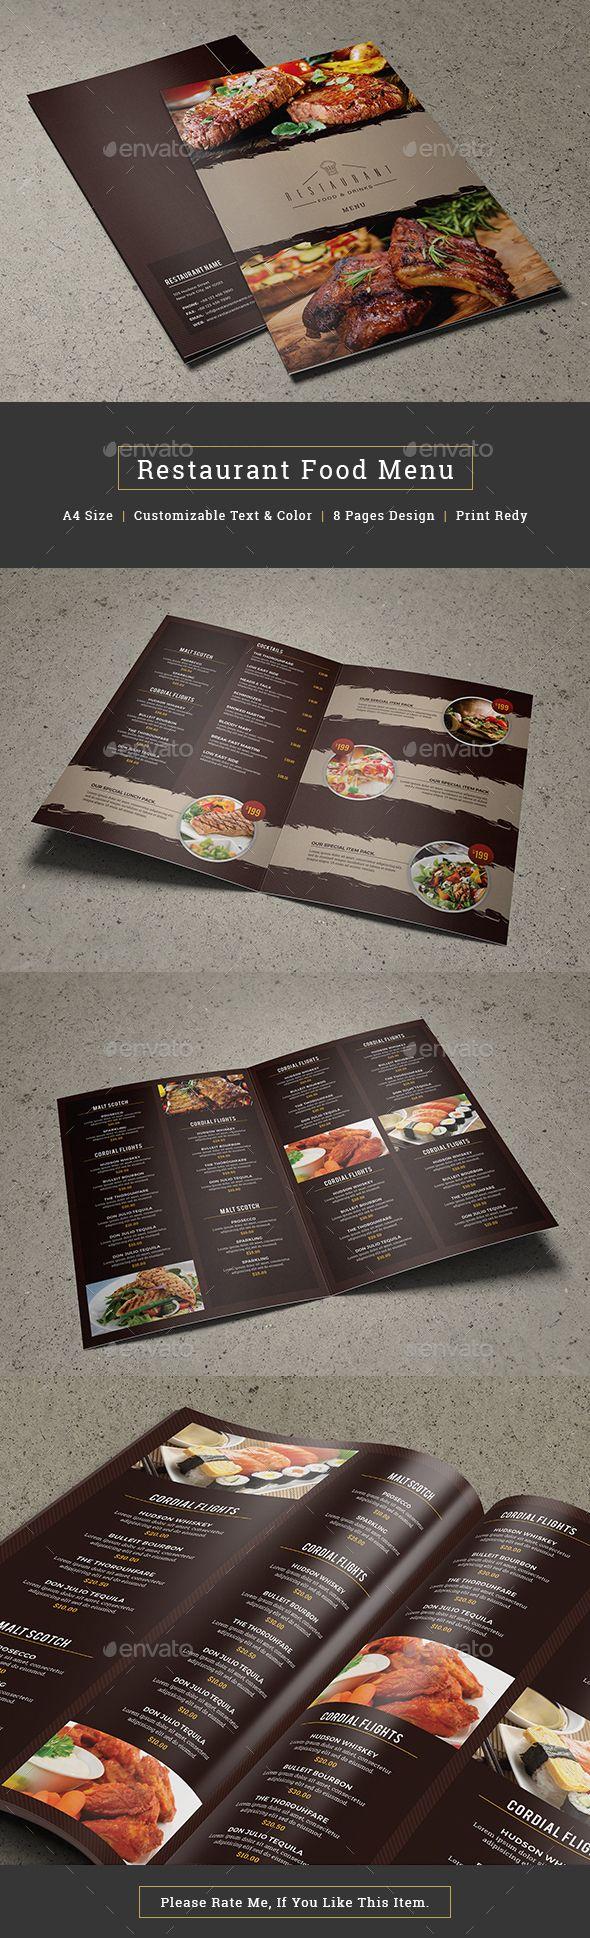 261 best Menu design images on Pinterest | Creative, Food graphic ...